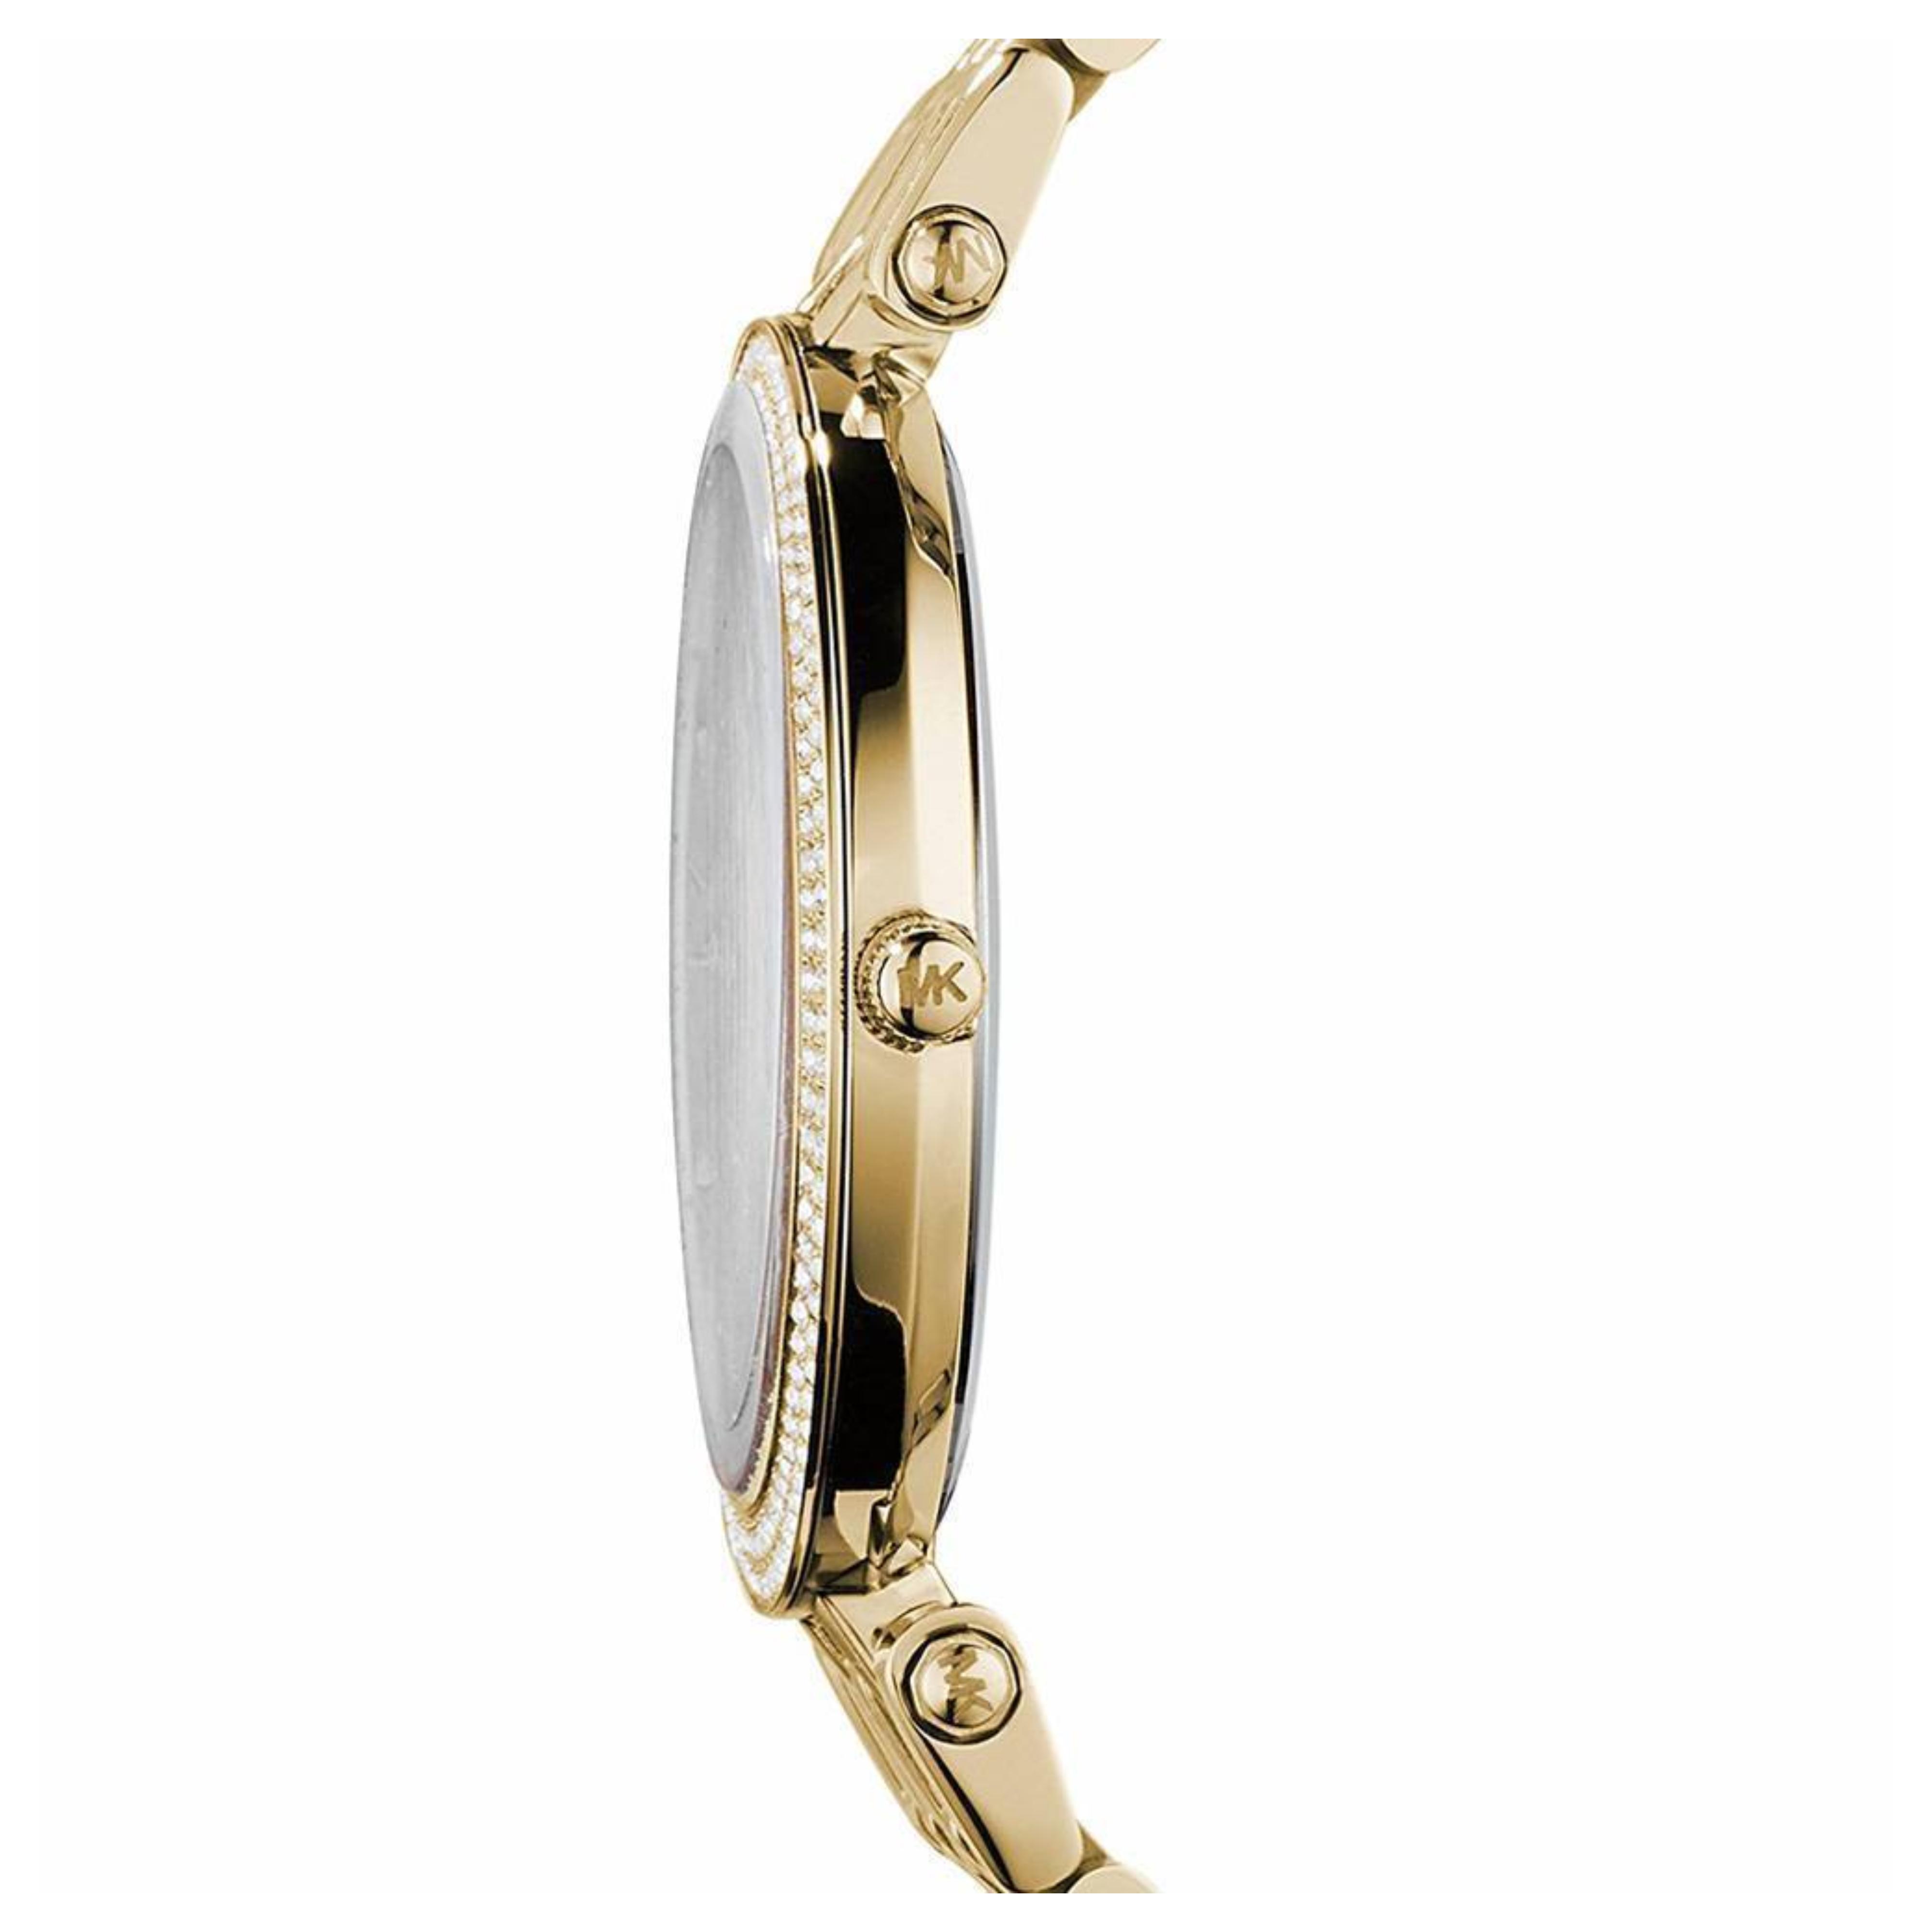 b77c902c933 Sentinel Michael Kors Darci Women s Watch│Gold Sunray Dial│Gold Tone  Bracelet Band│MK3368